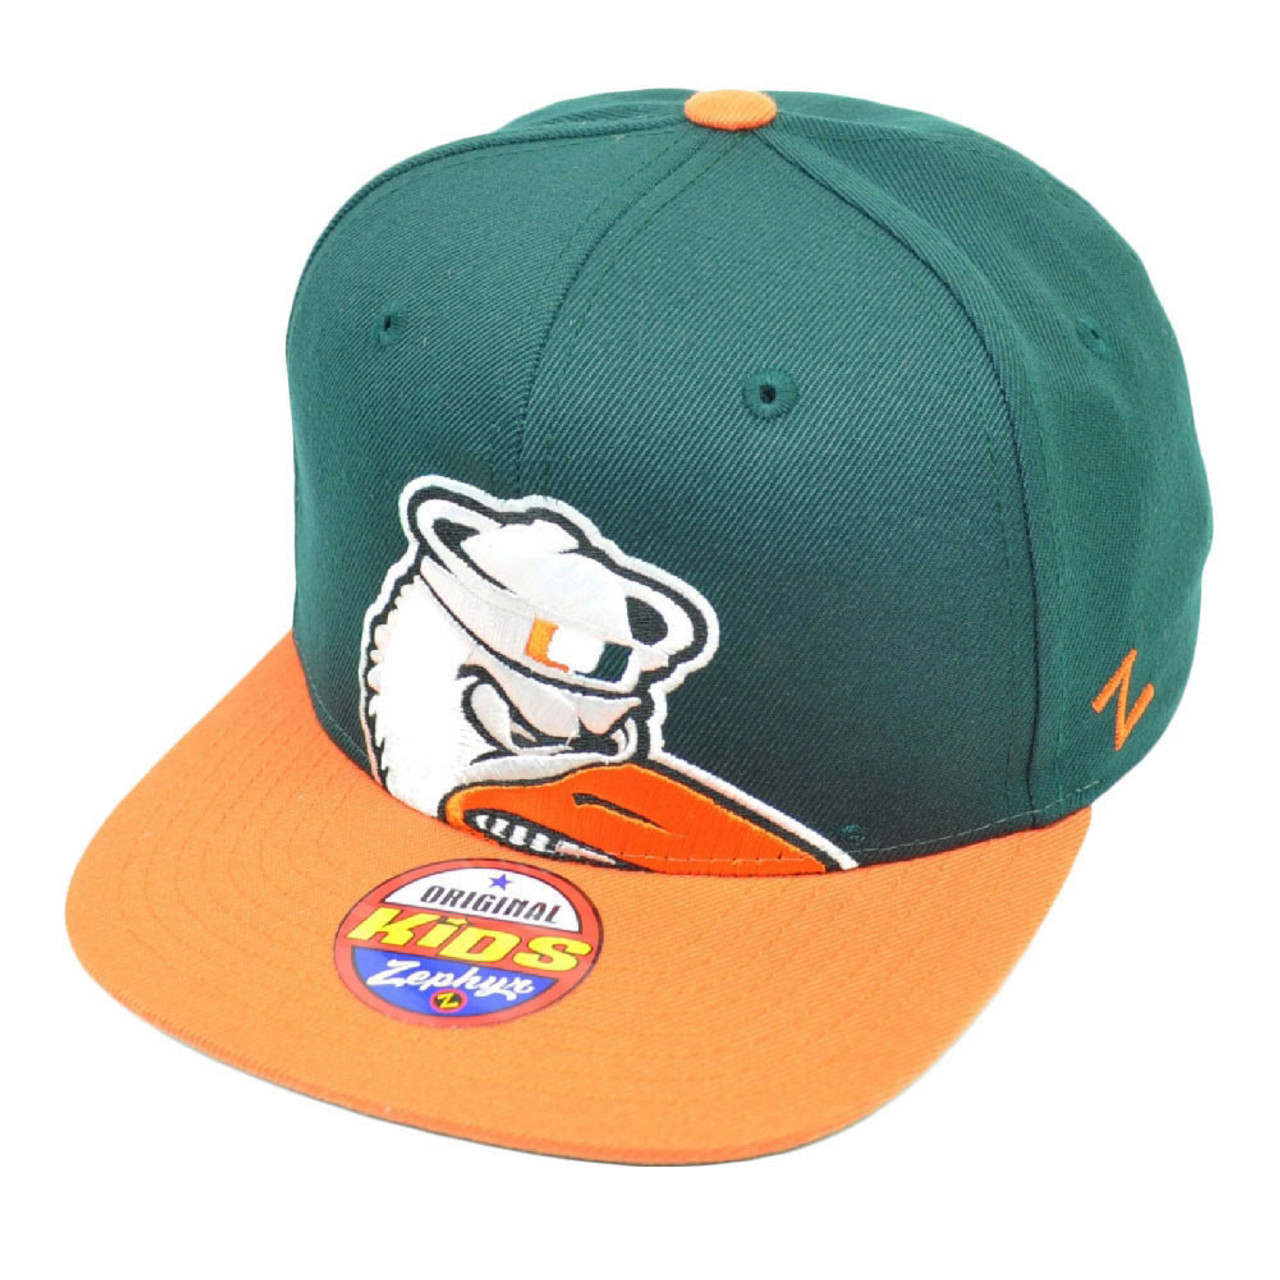 9b095c4d59f5 NCAA Zephyr Miami Hurricanes Canes Peek Snapback Flat Bill Hat Cap Green  Kids